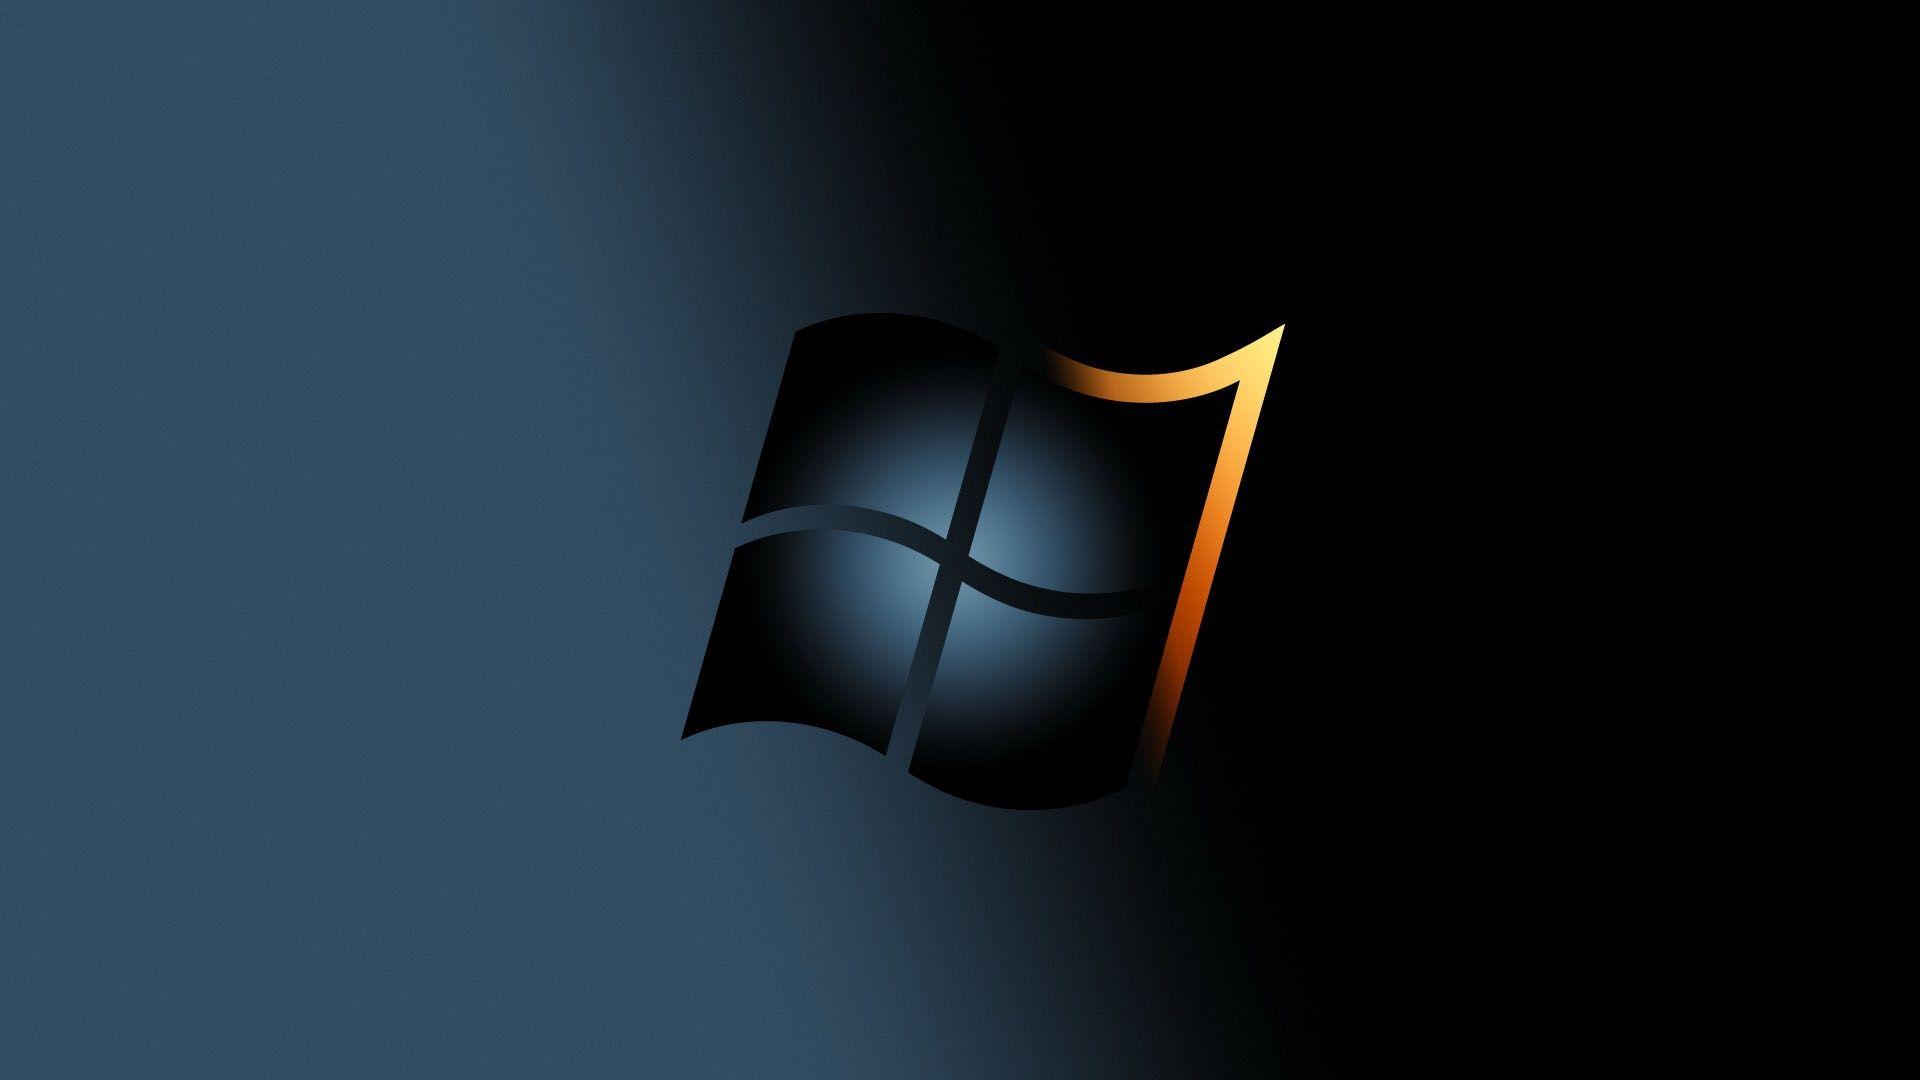 Windows 7 ultimate desktop background   SF Wallpaper 1920x1080